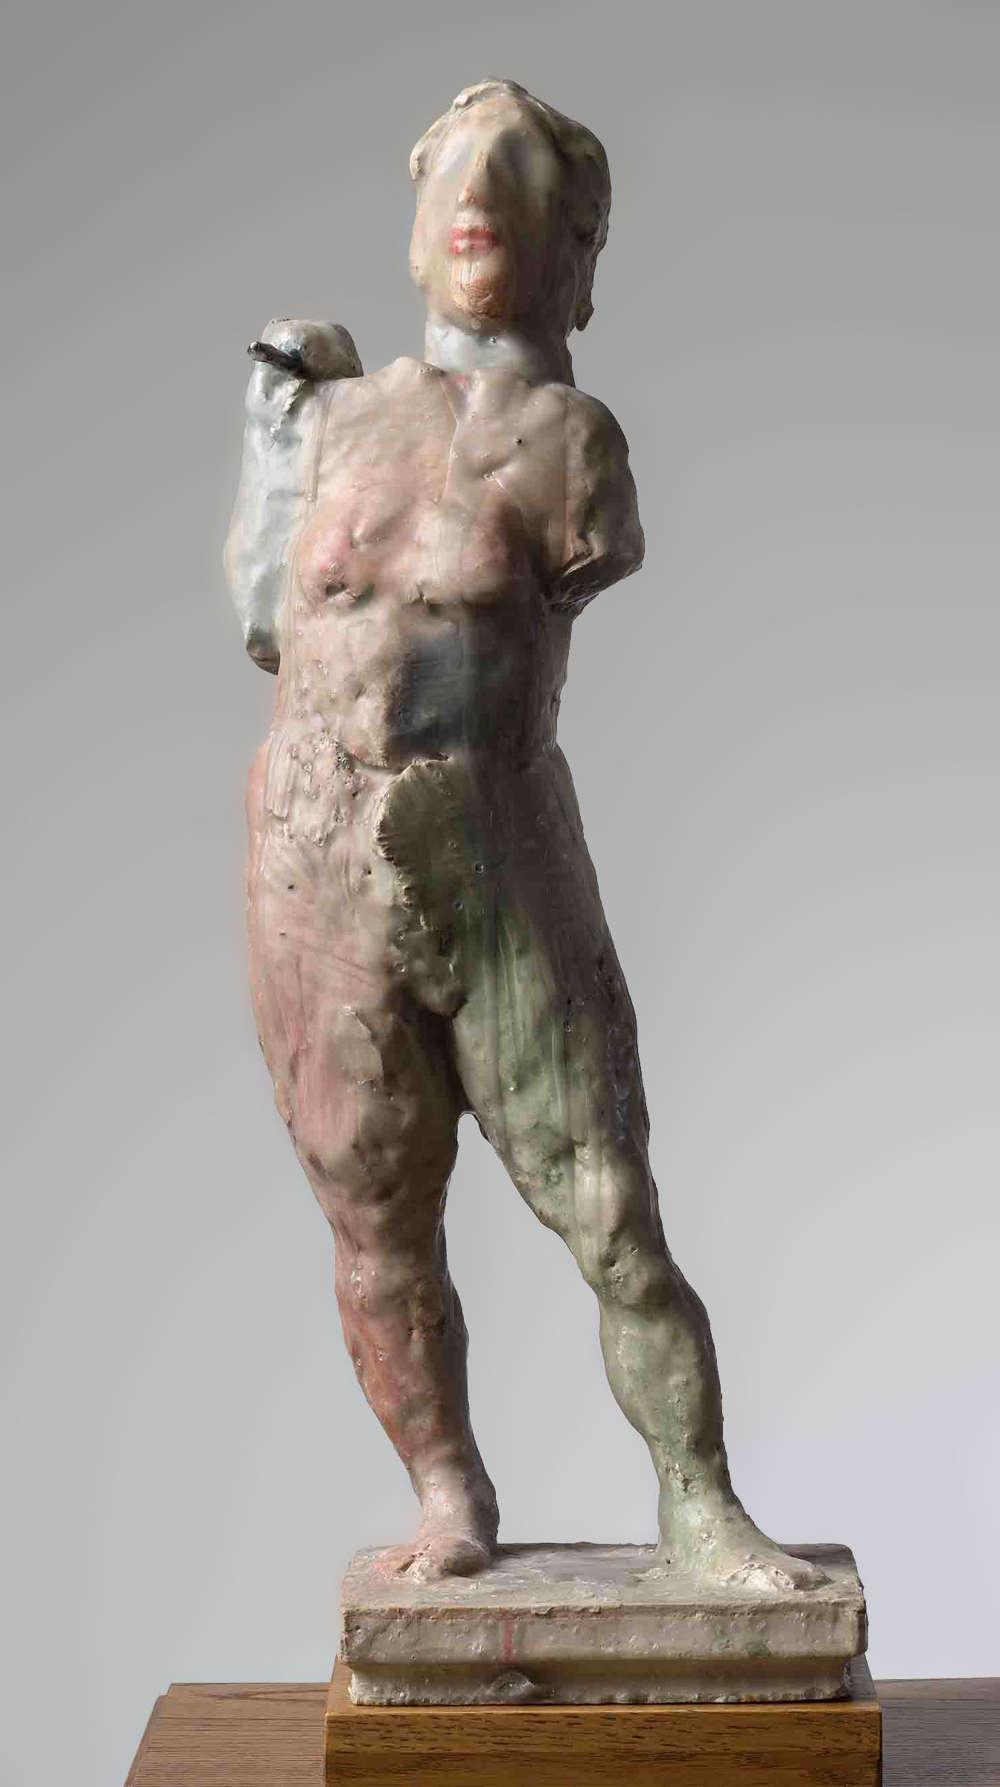 Markus Lüpertz, Diane, 2017. Plaster, wax 23 1/2 x 8 3/4 x 7 3/4 inches 59.5 x 22.5 x 19.5 cm